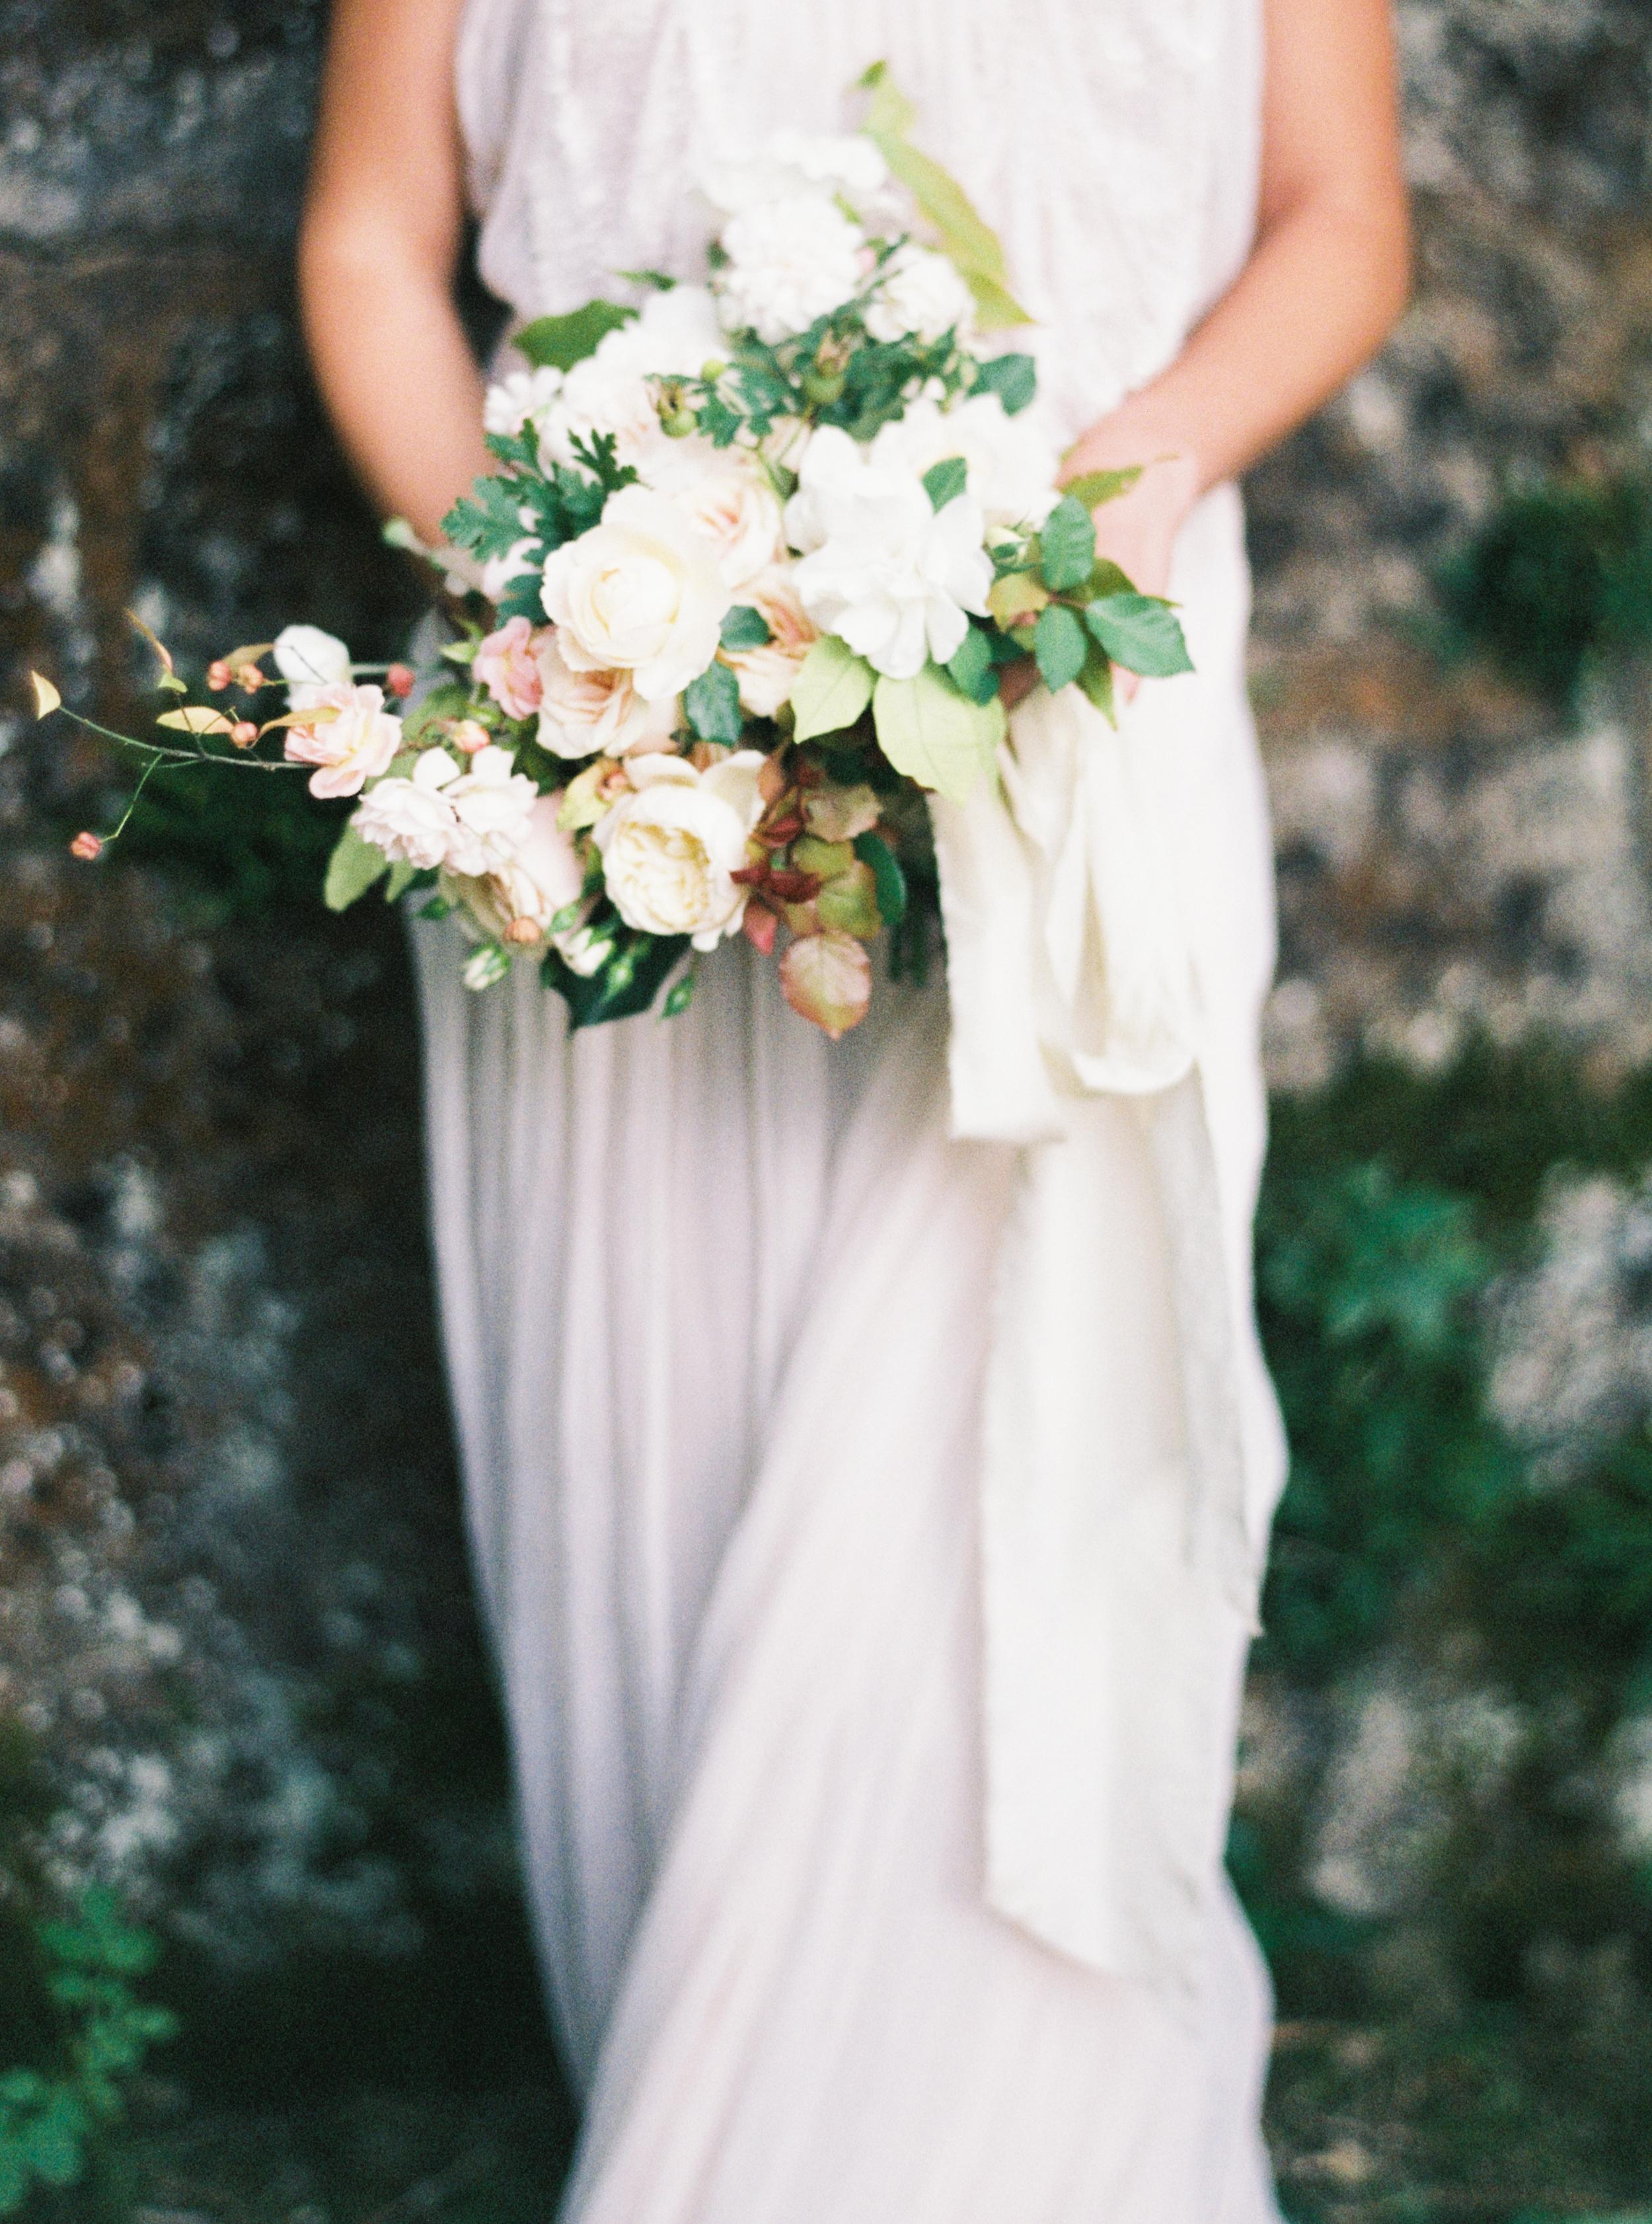 Photo by Tamara Gigola. European Workshop by Ginny Au. Inspirational bridal shoot. Flowers by Sara Winward, dress by Gossamer Vintage.